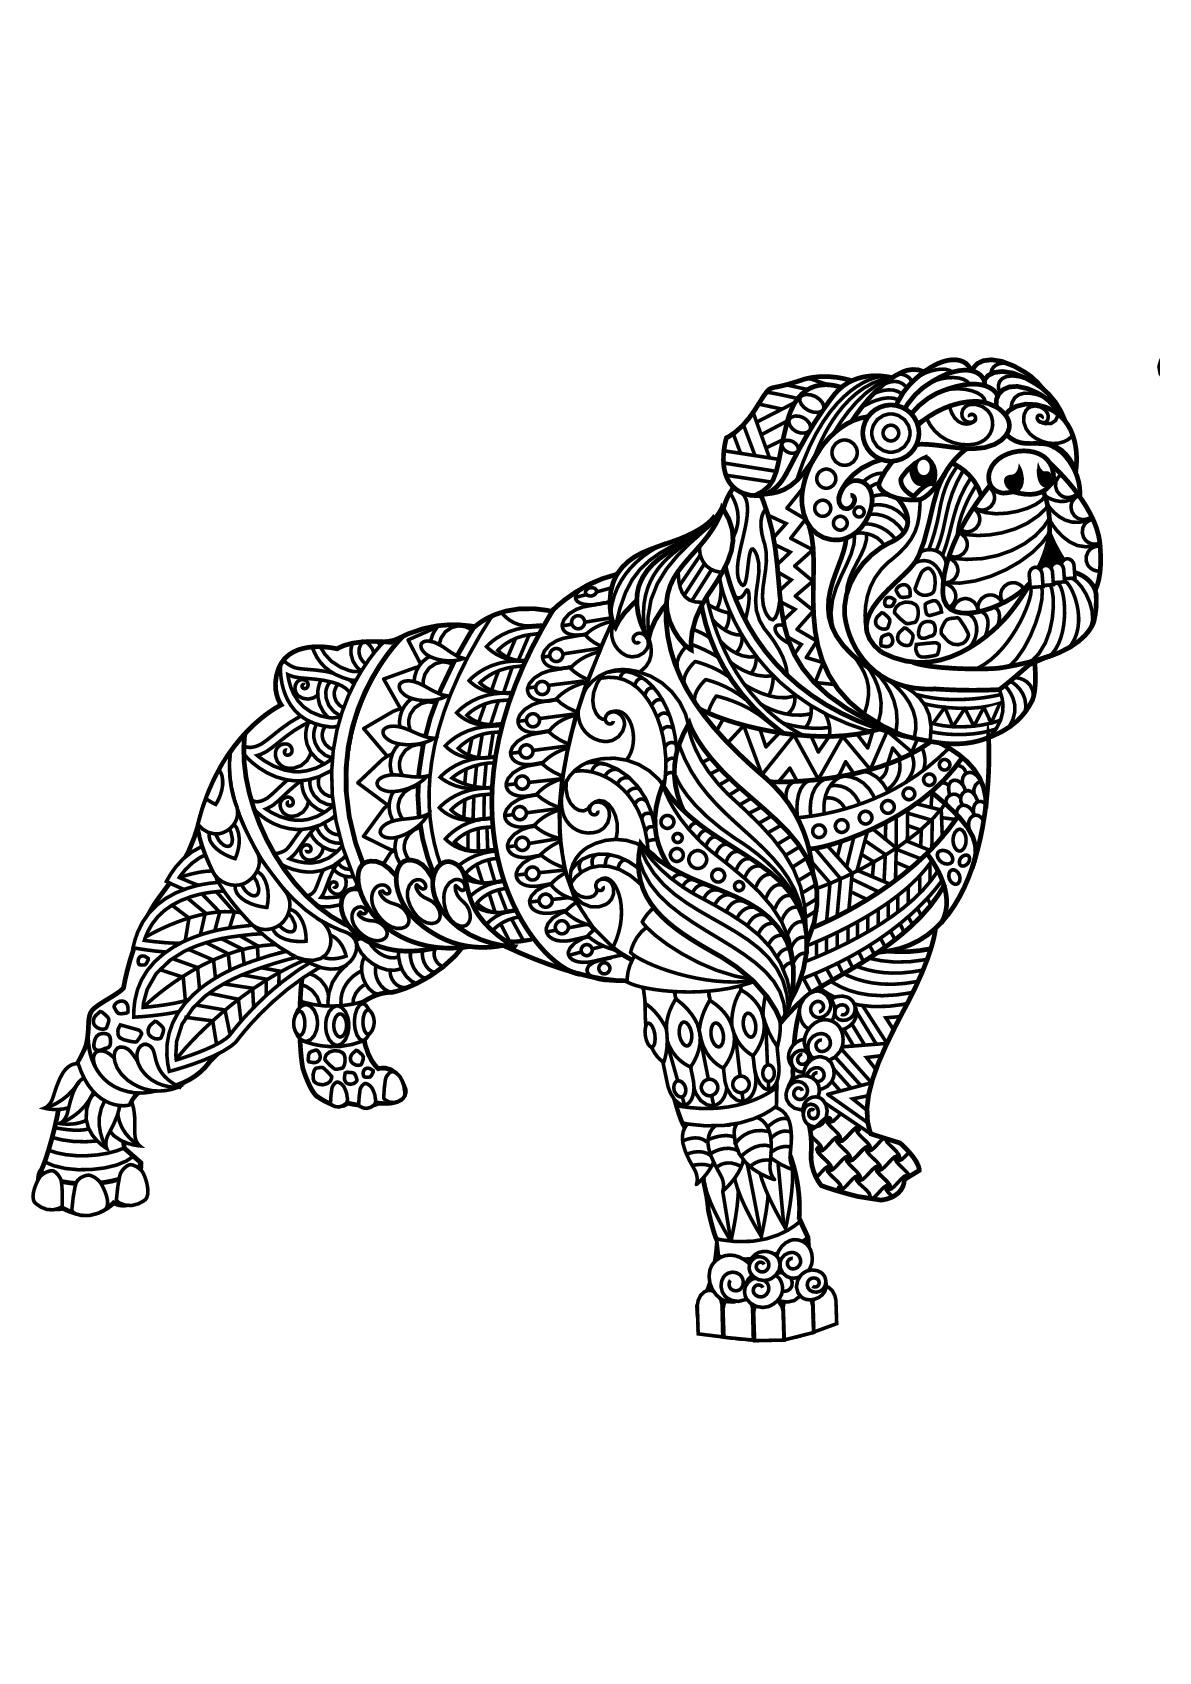 Bulldog debout et jolis motifs